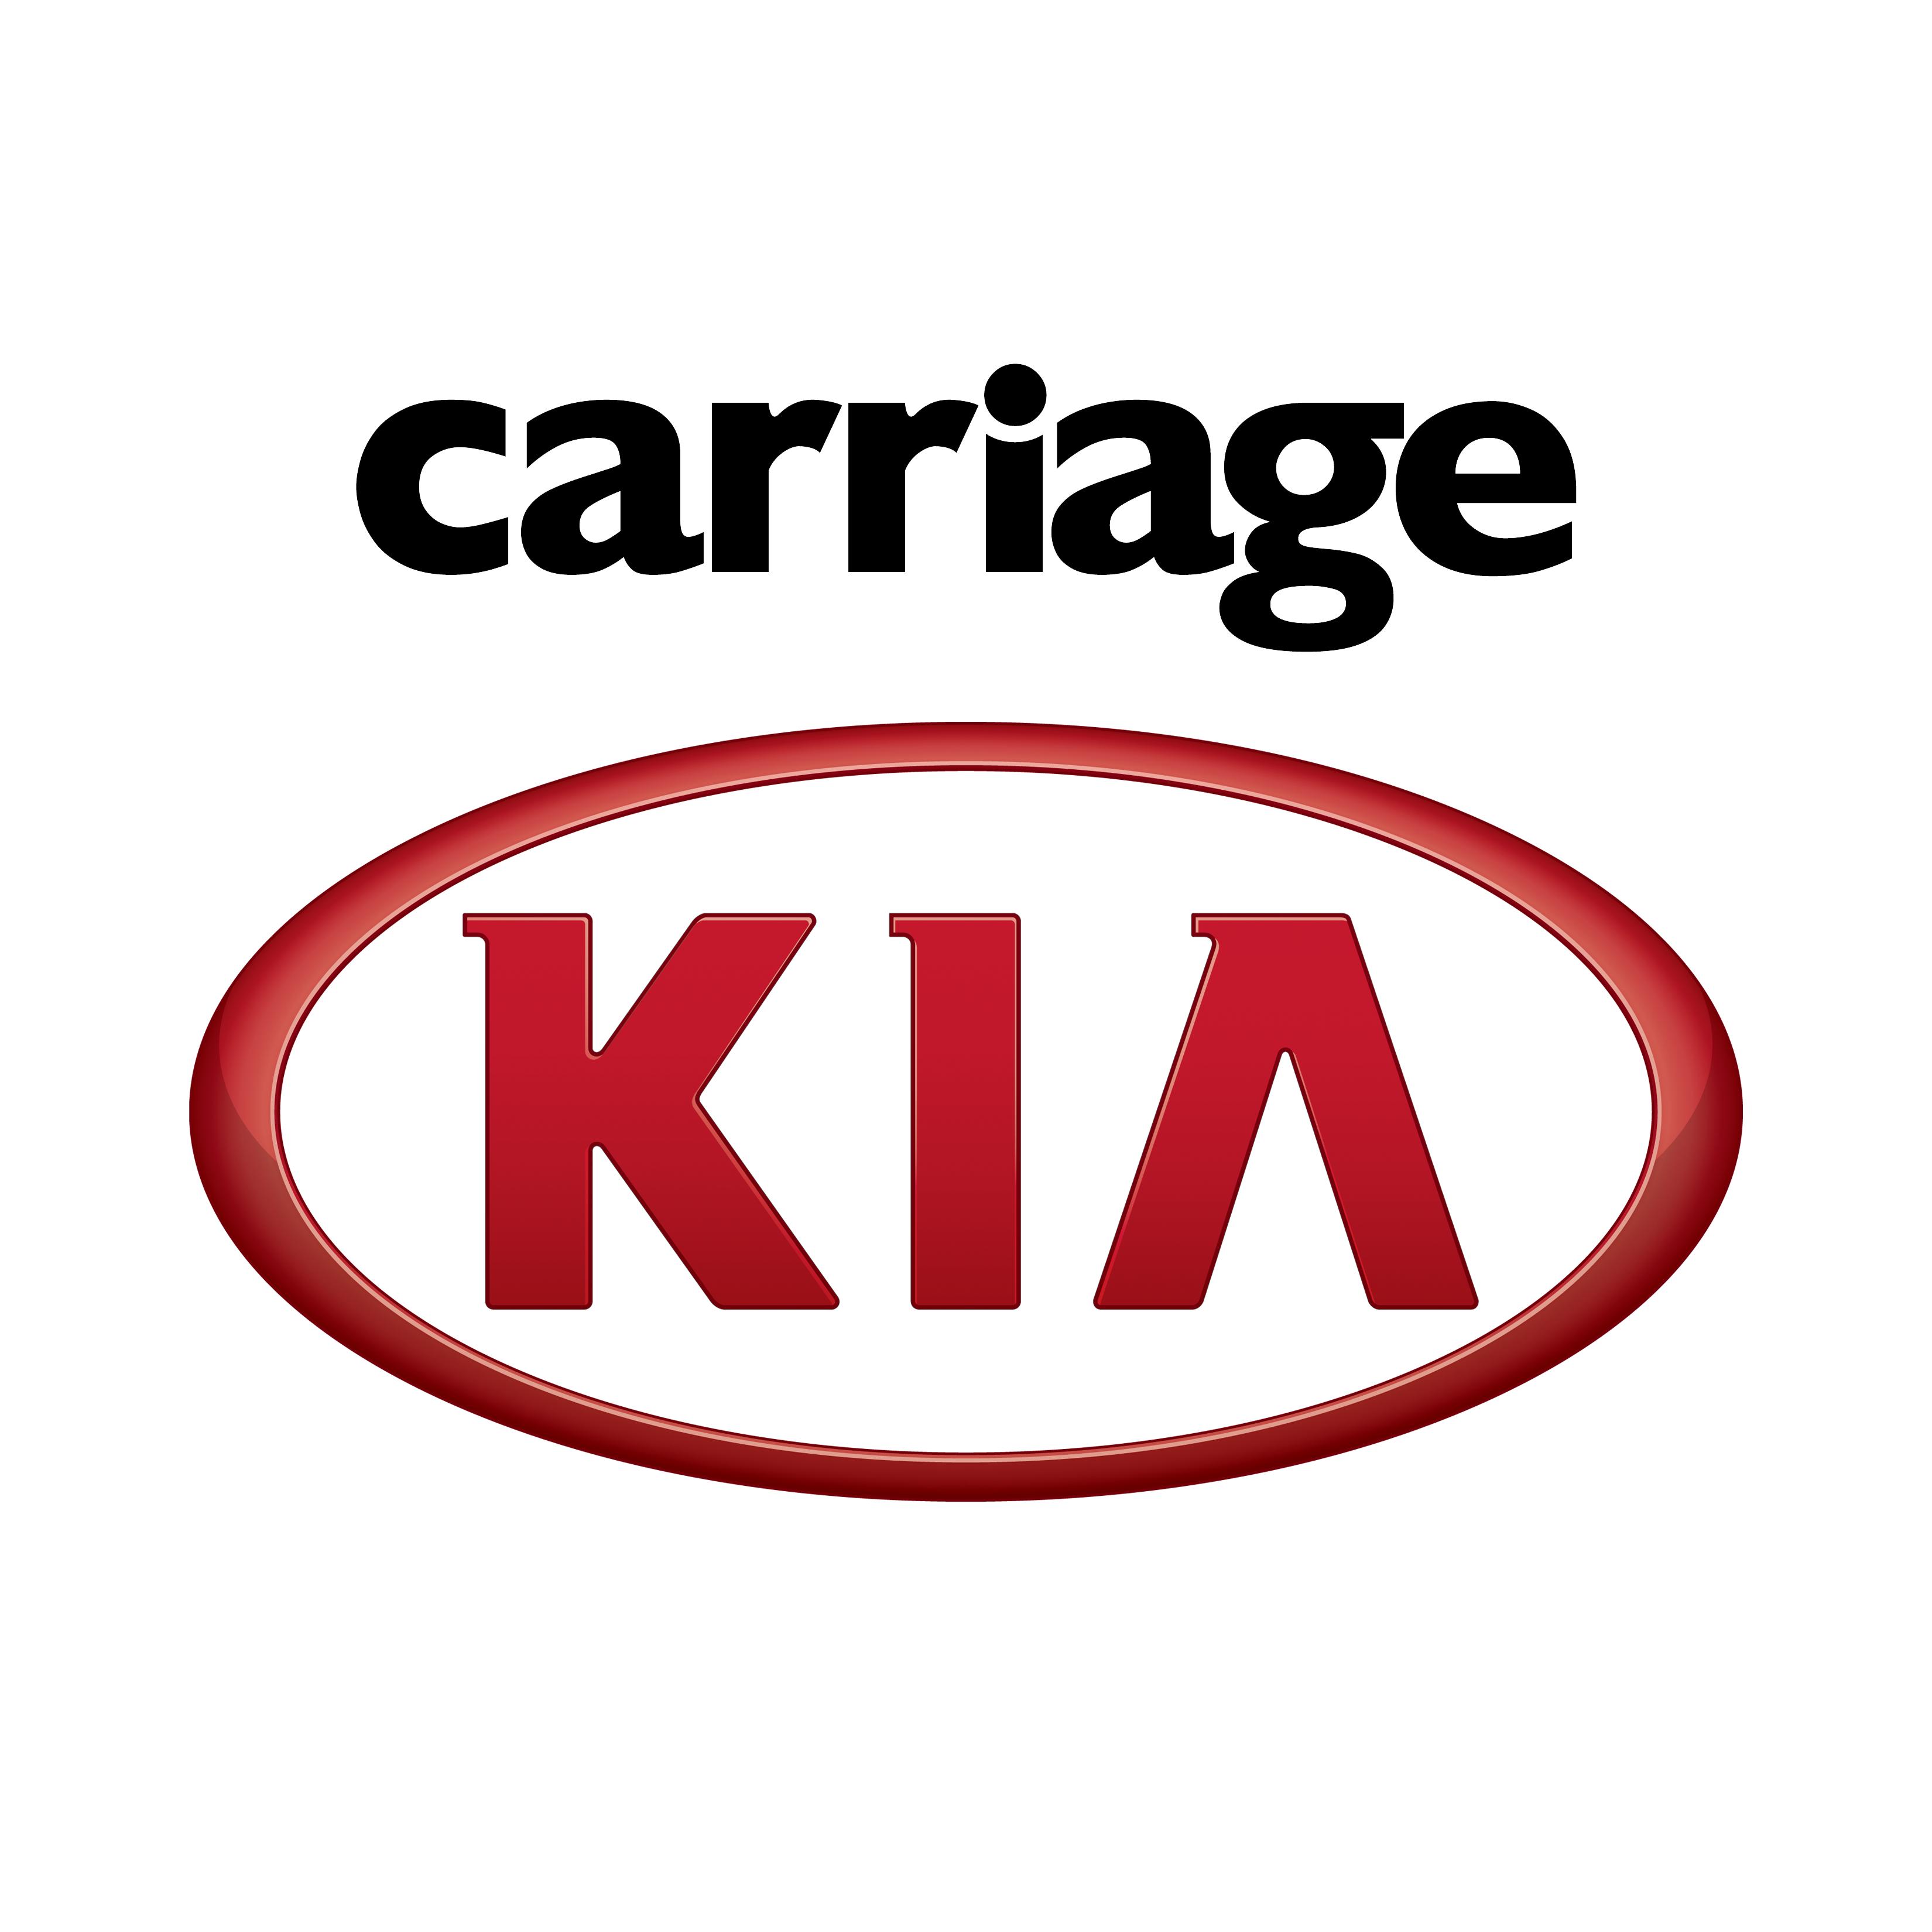 Carriage Kia